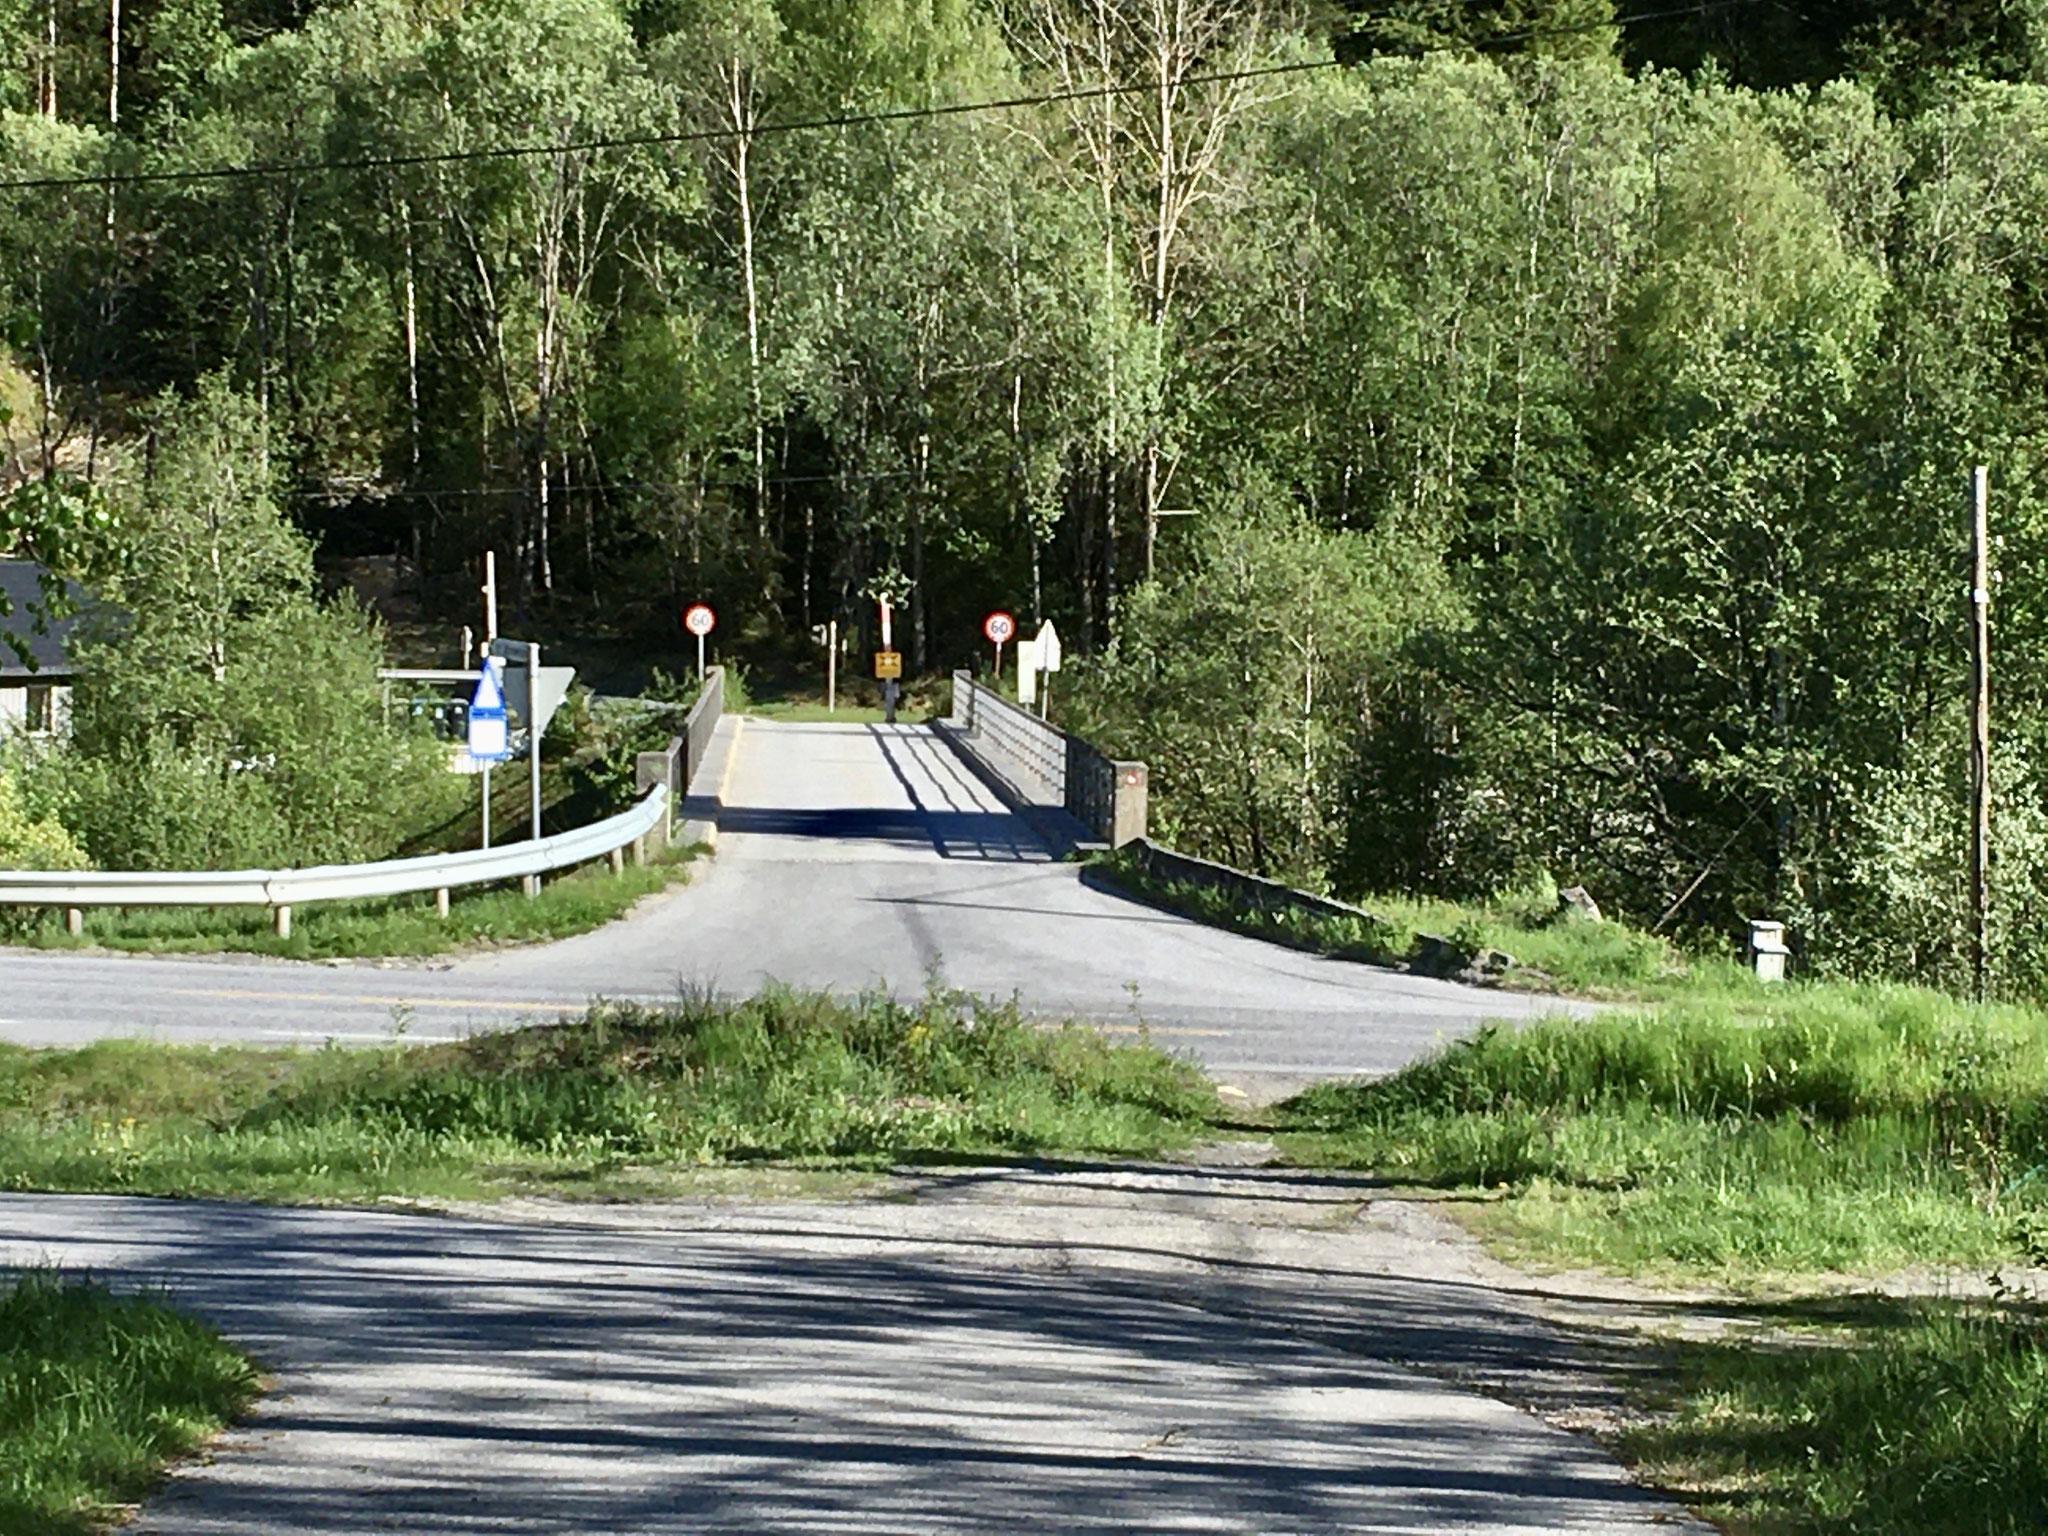 than cross the main road an the bridge over Måna river